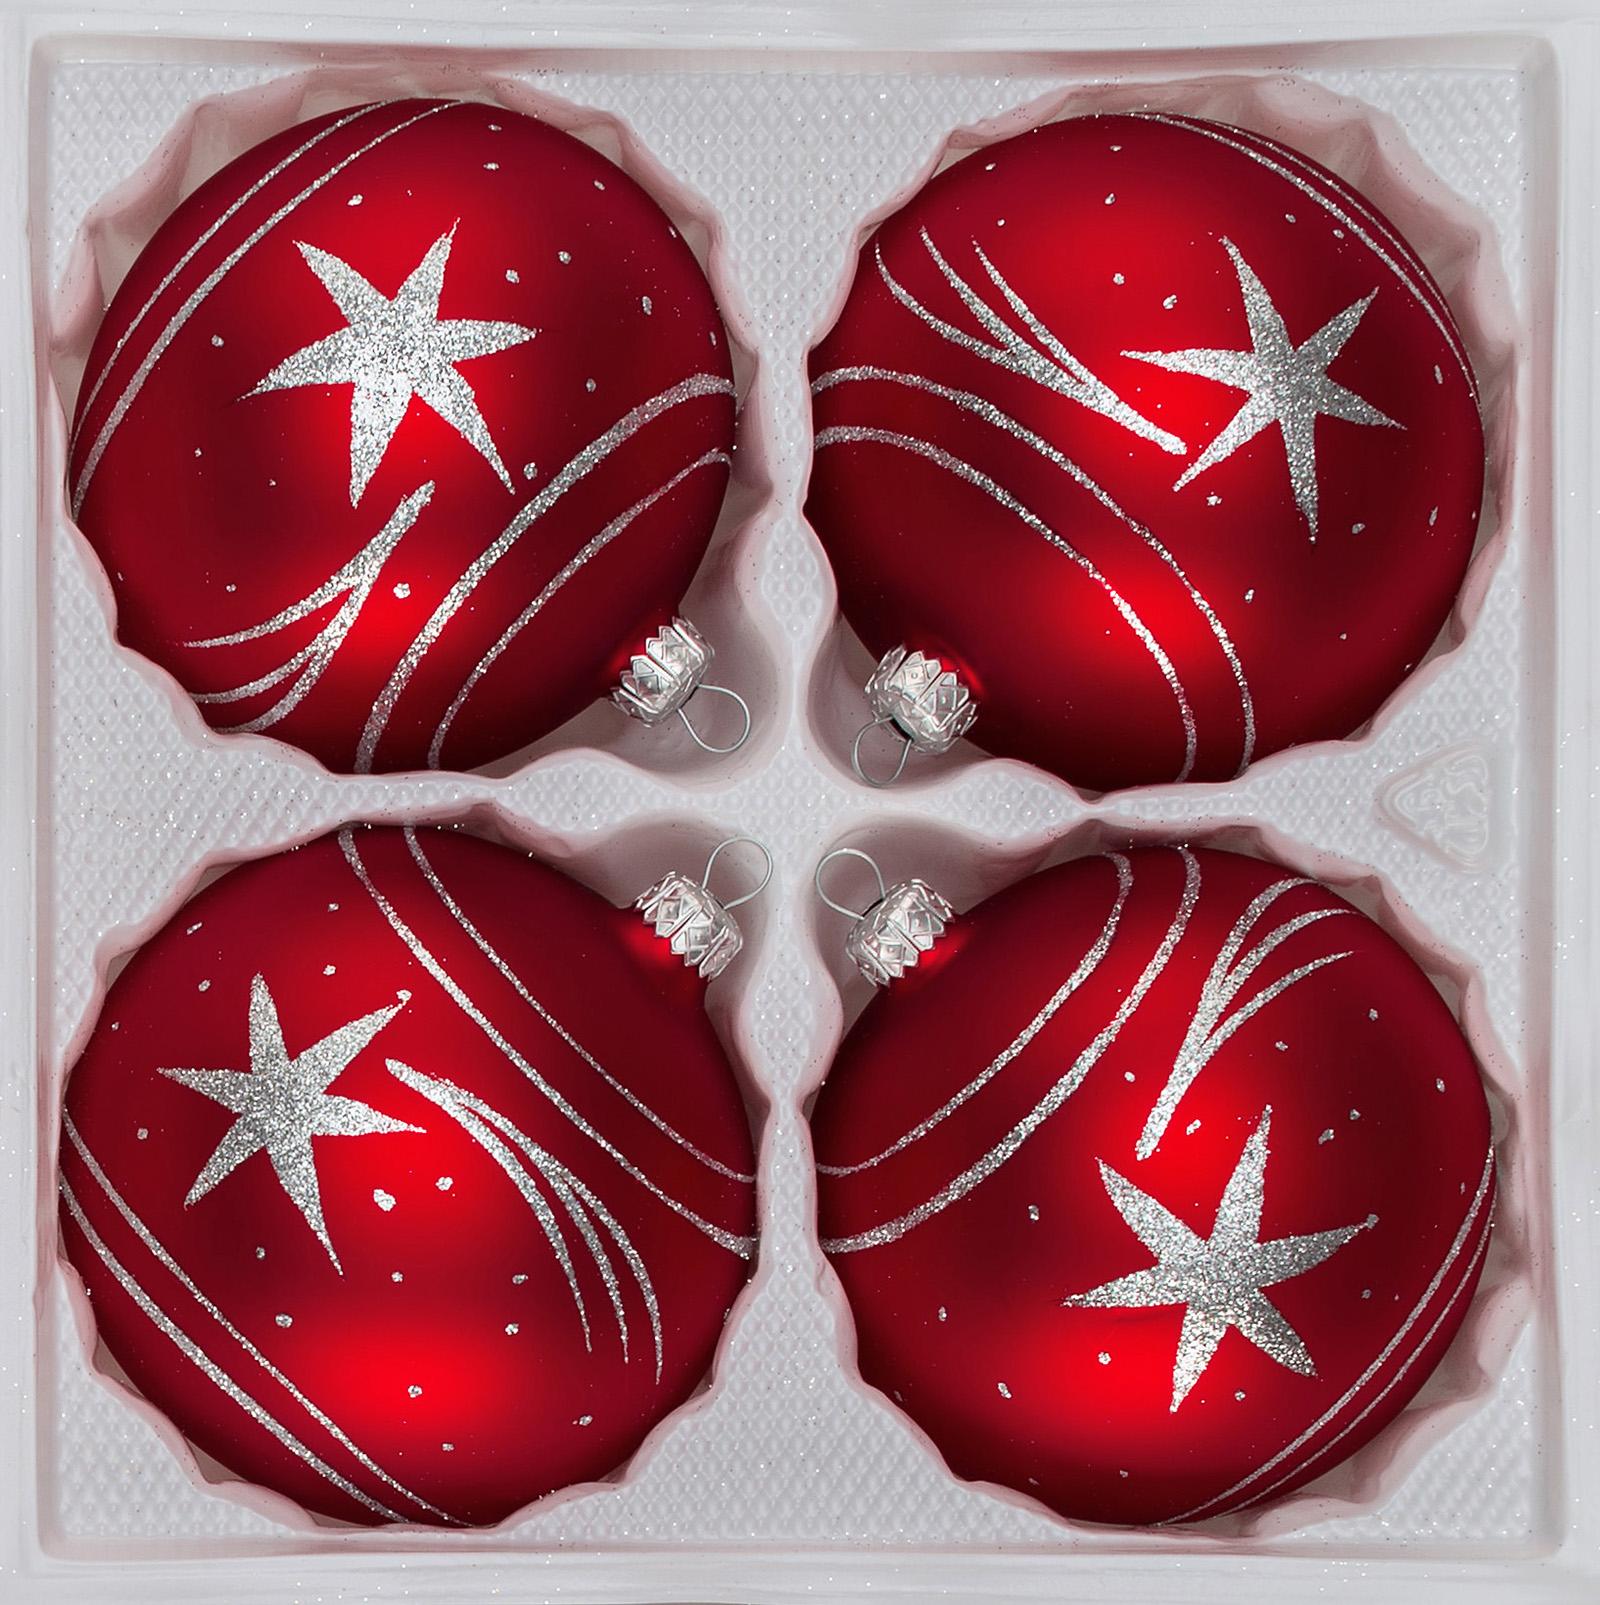 4 pcs. Glass Christmas Balls Set 3,93 Inches Ø in